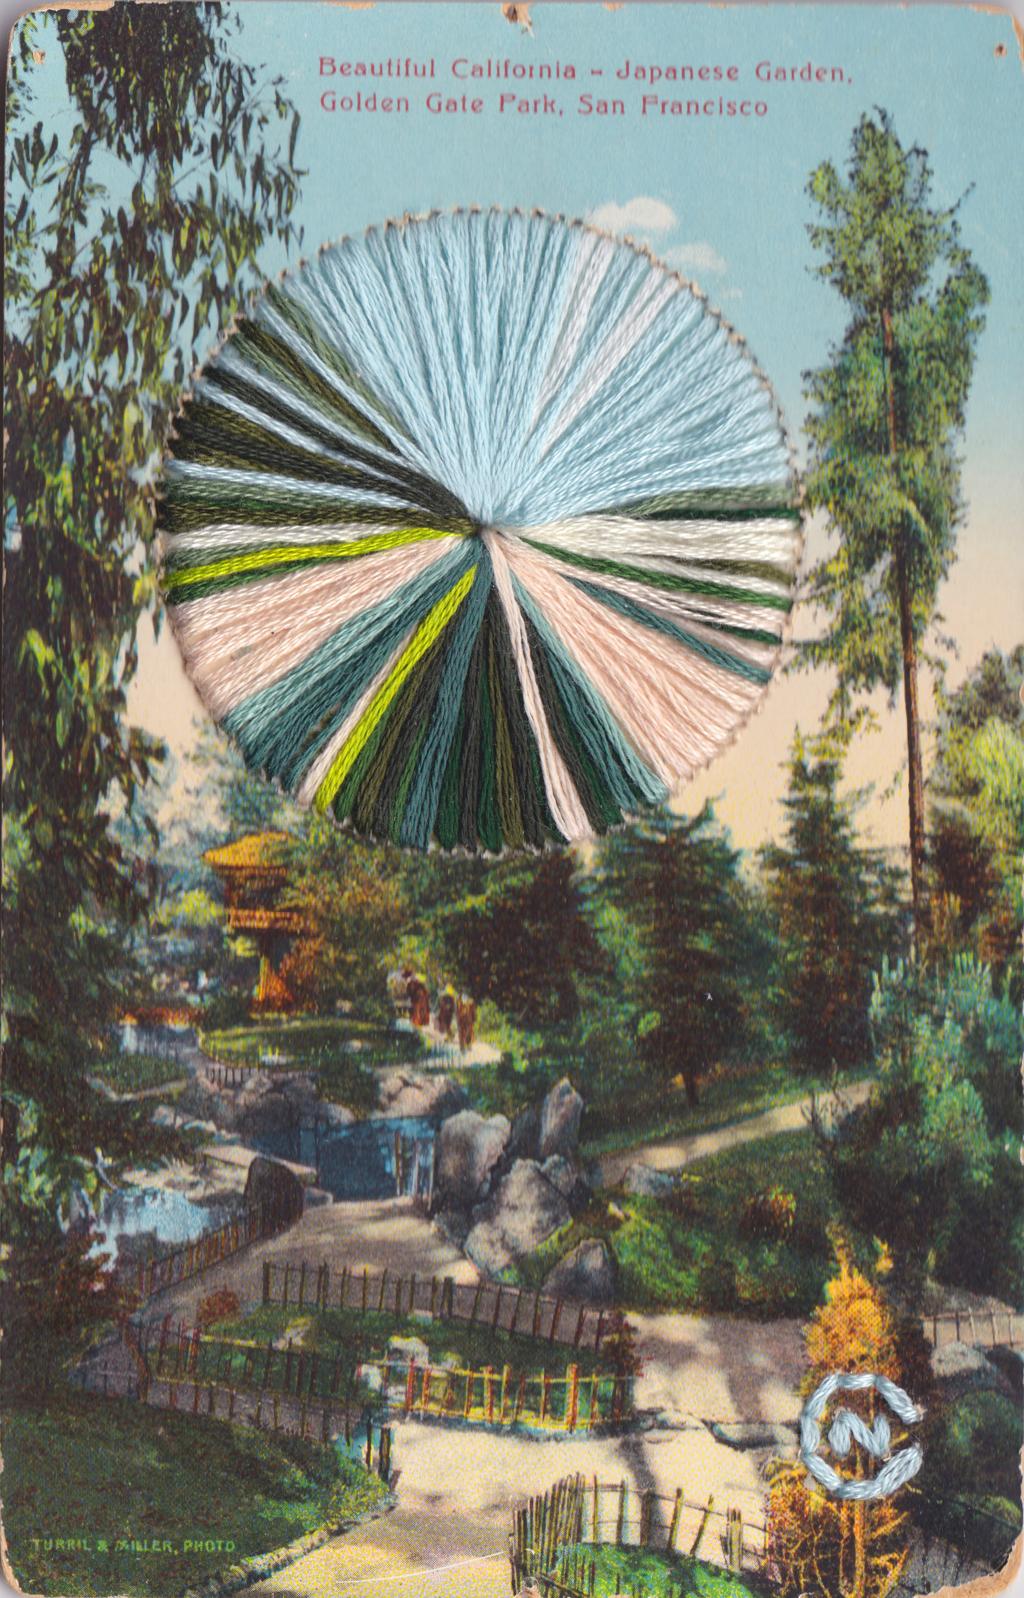 Japanese Garden by Natalie Ciccoricco